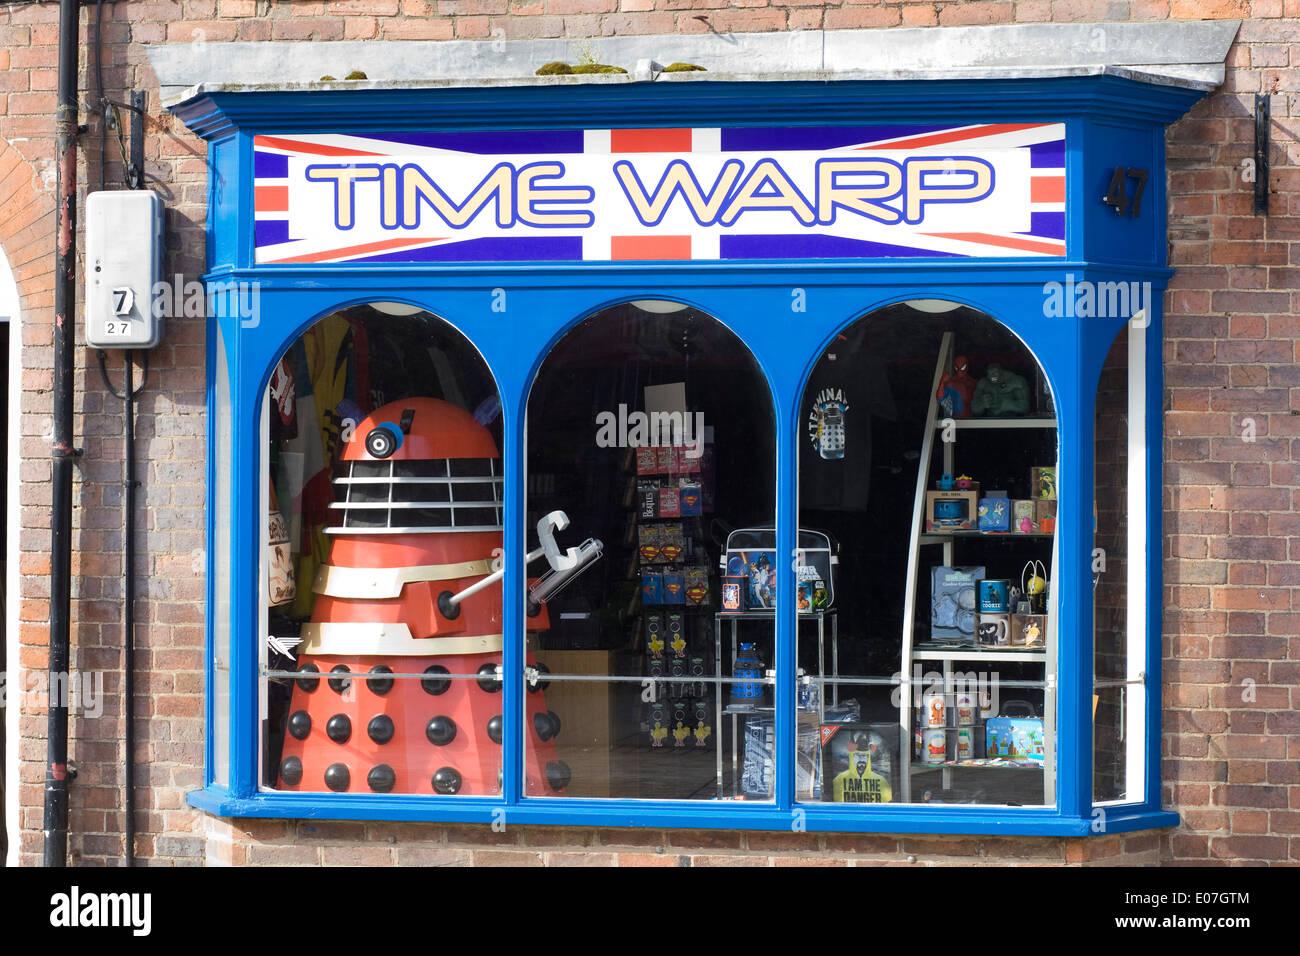 The Time Warp Shop window Stratford upon Avon England - Stock Image